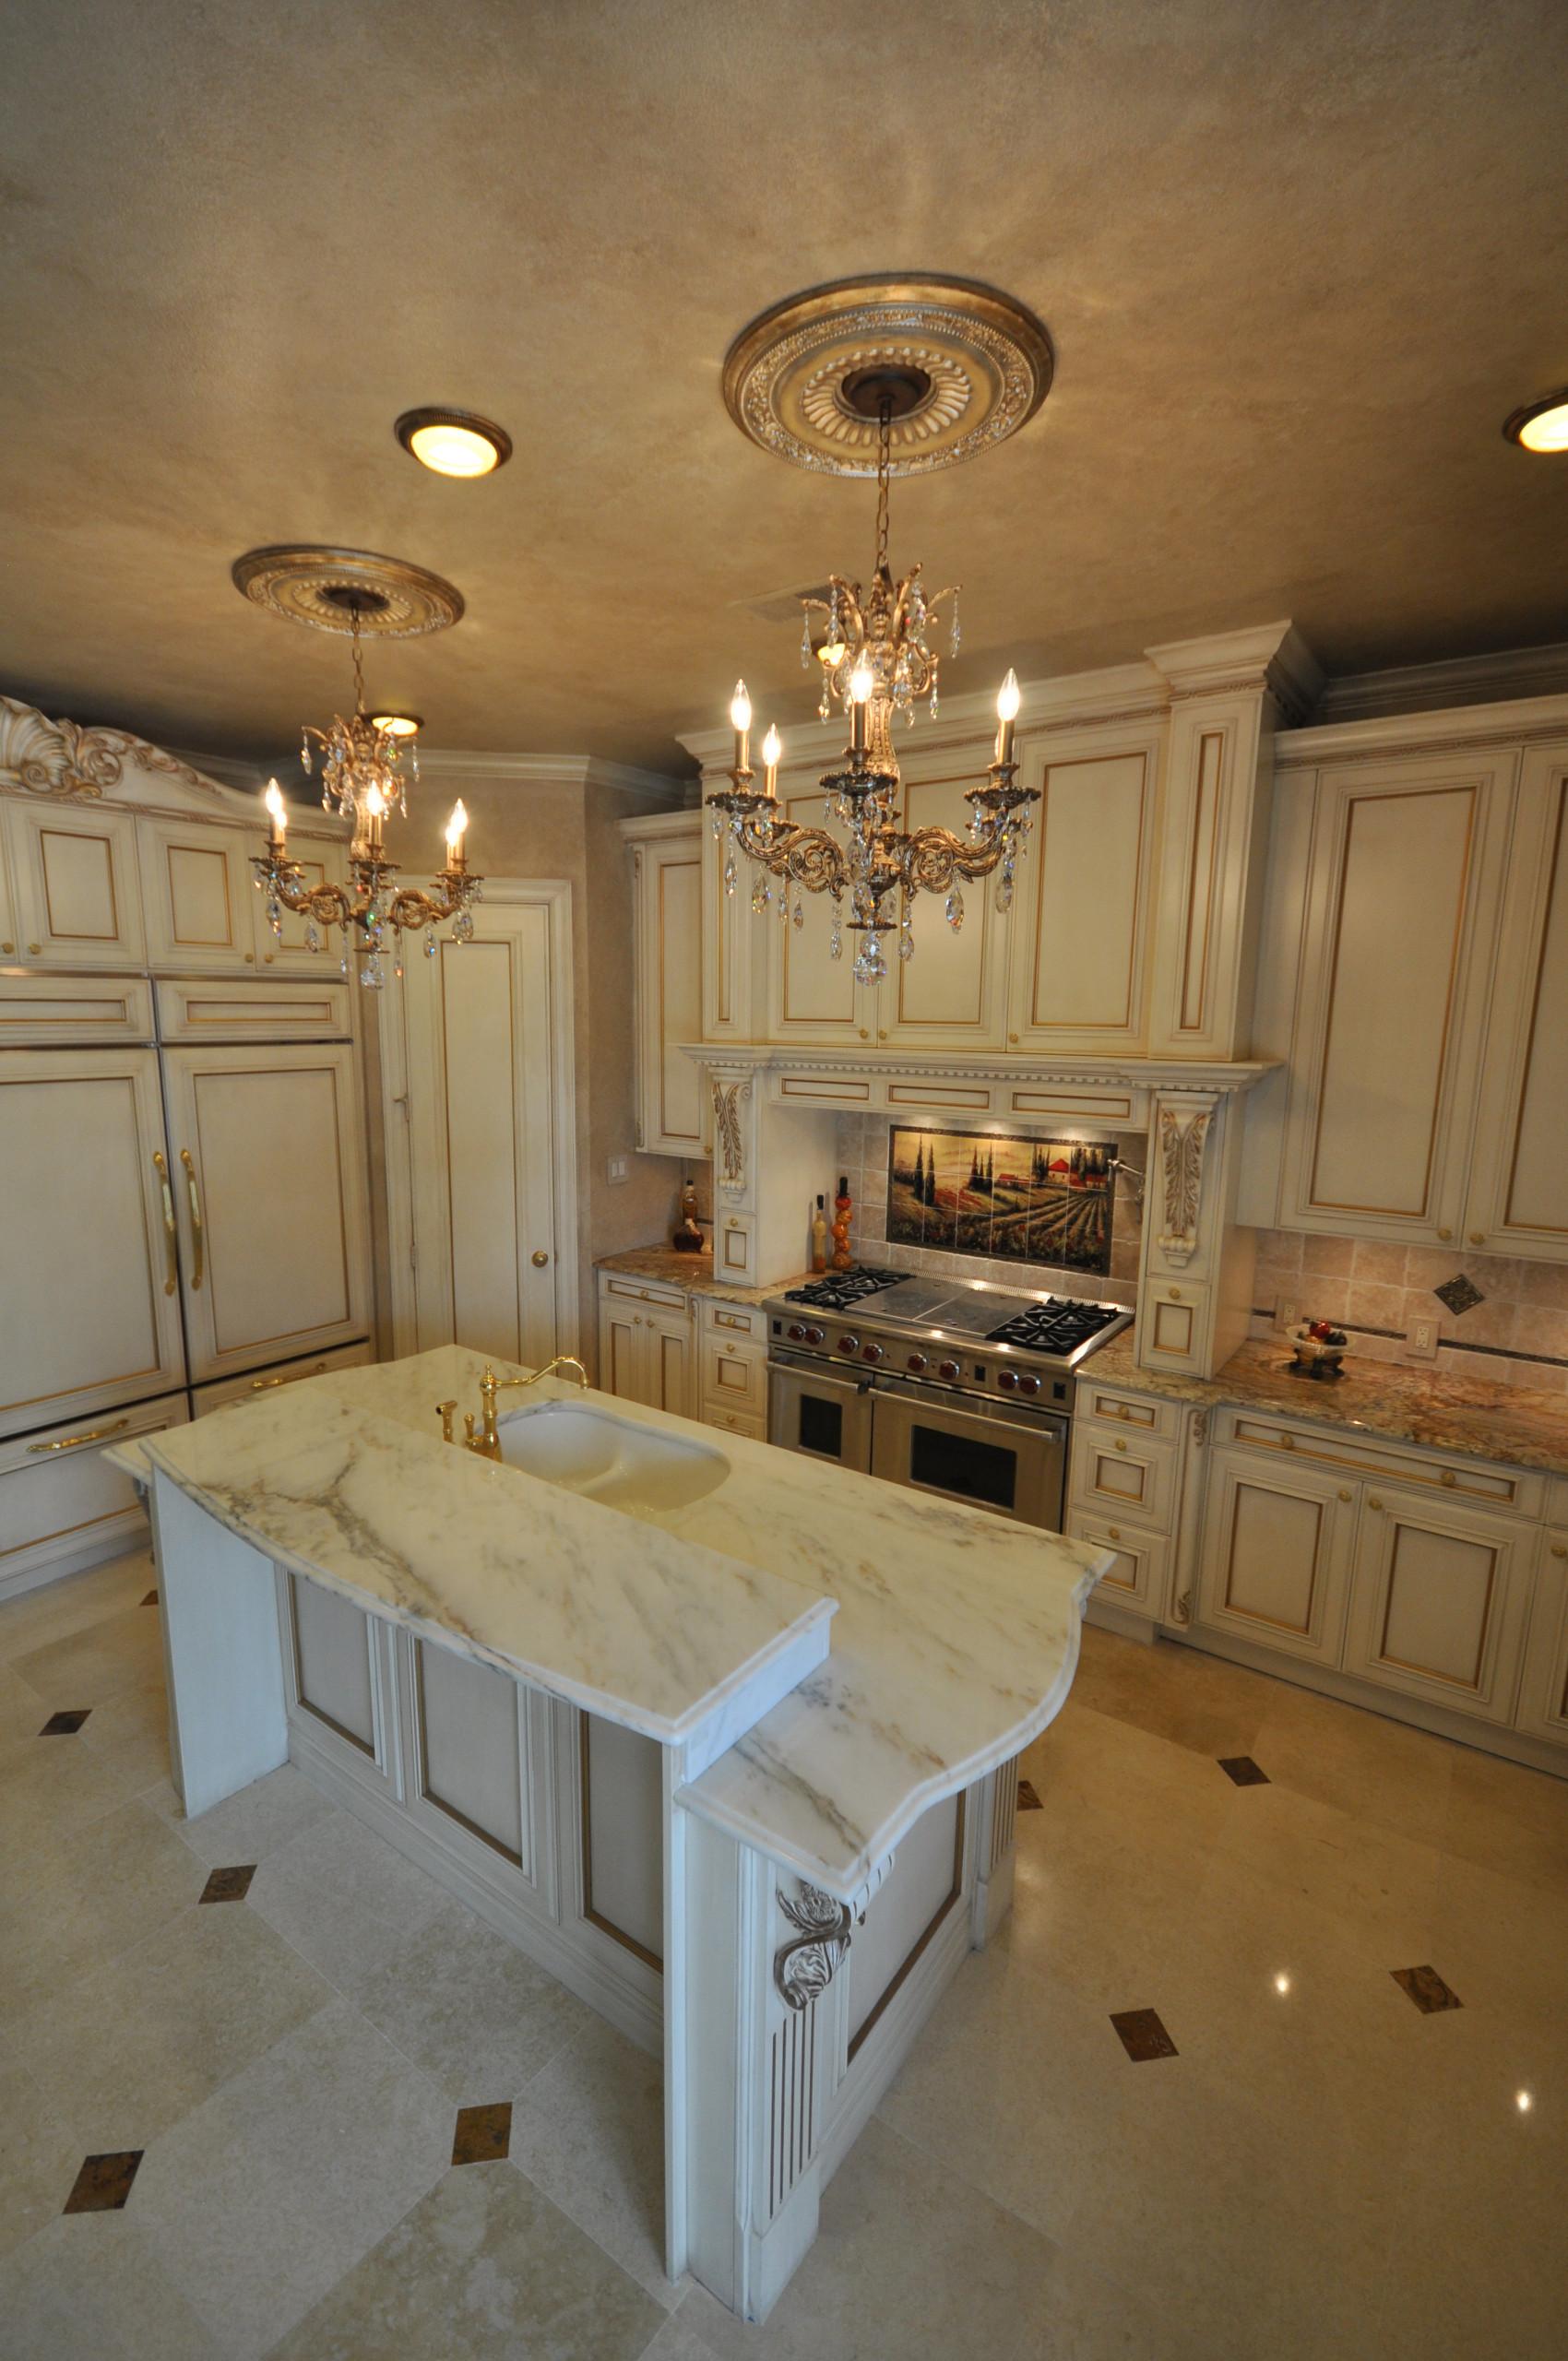 Kitchen and floor remodel.x